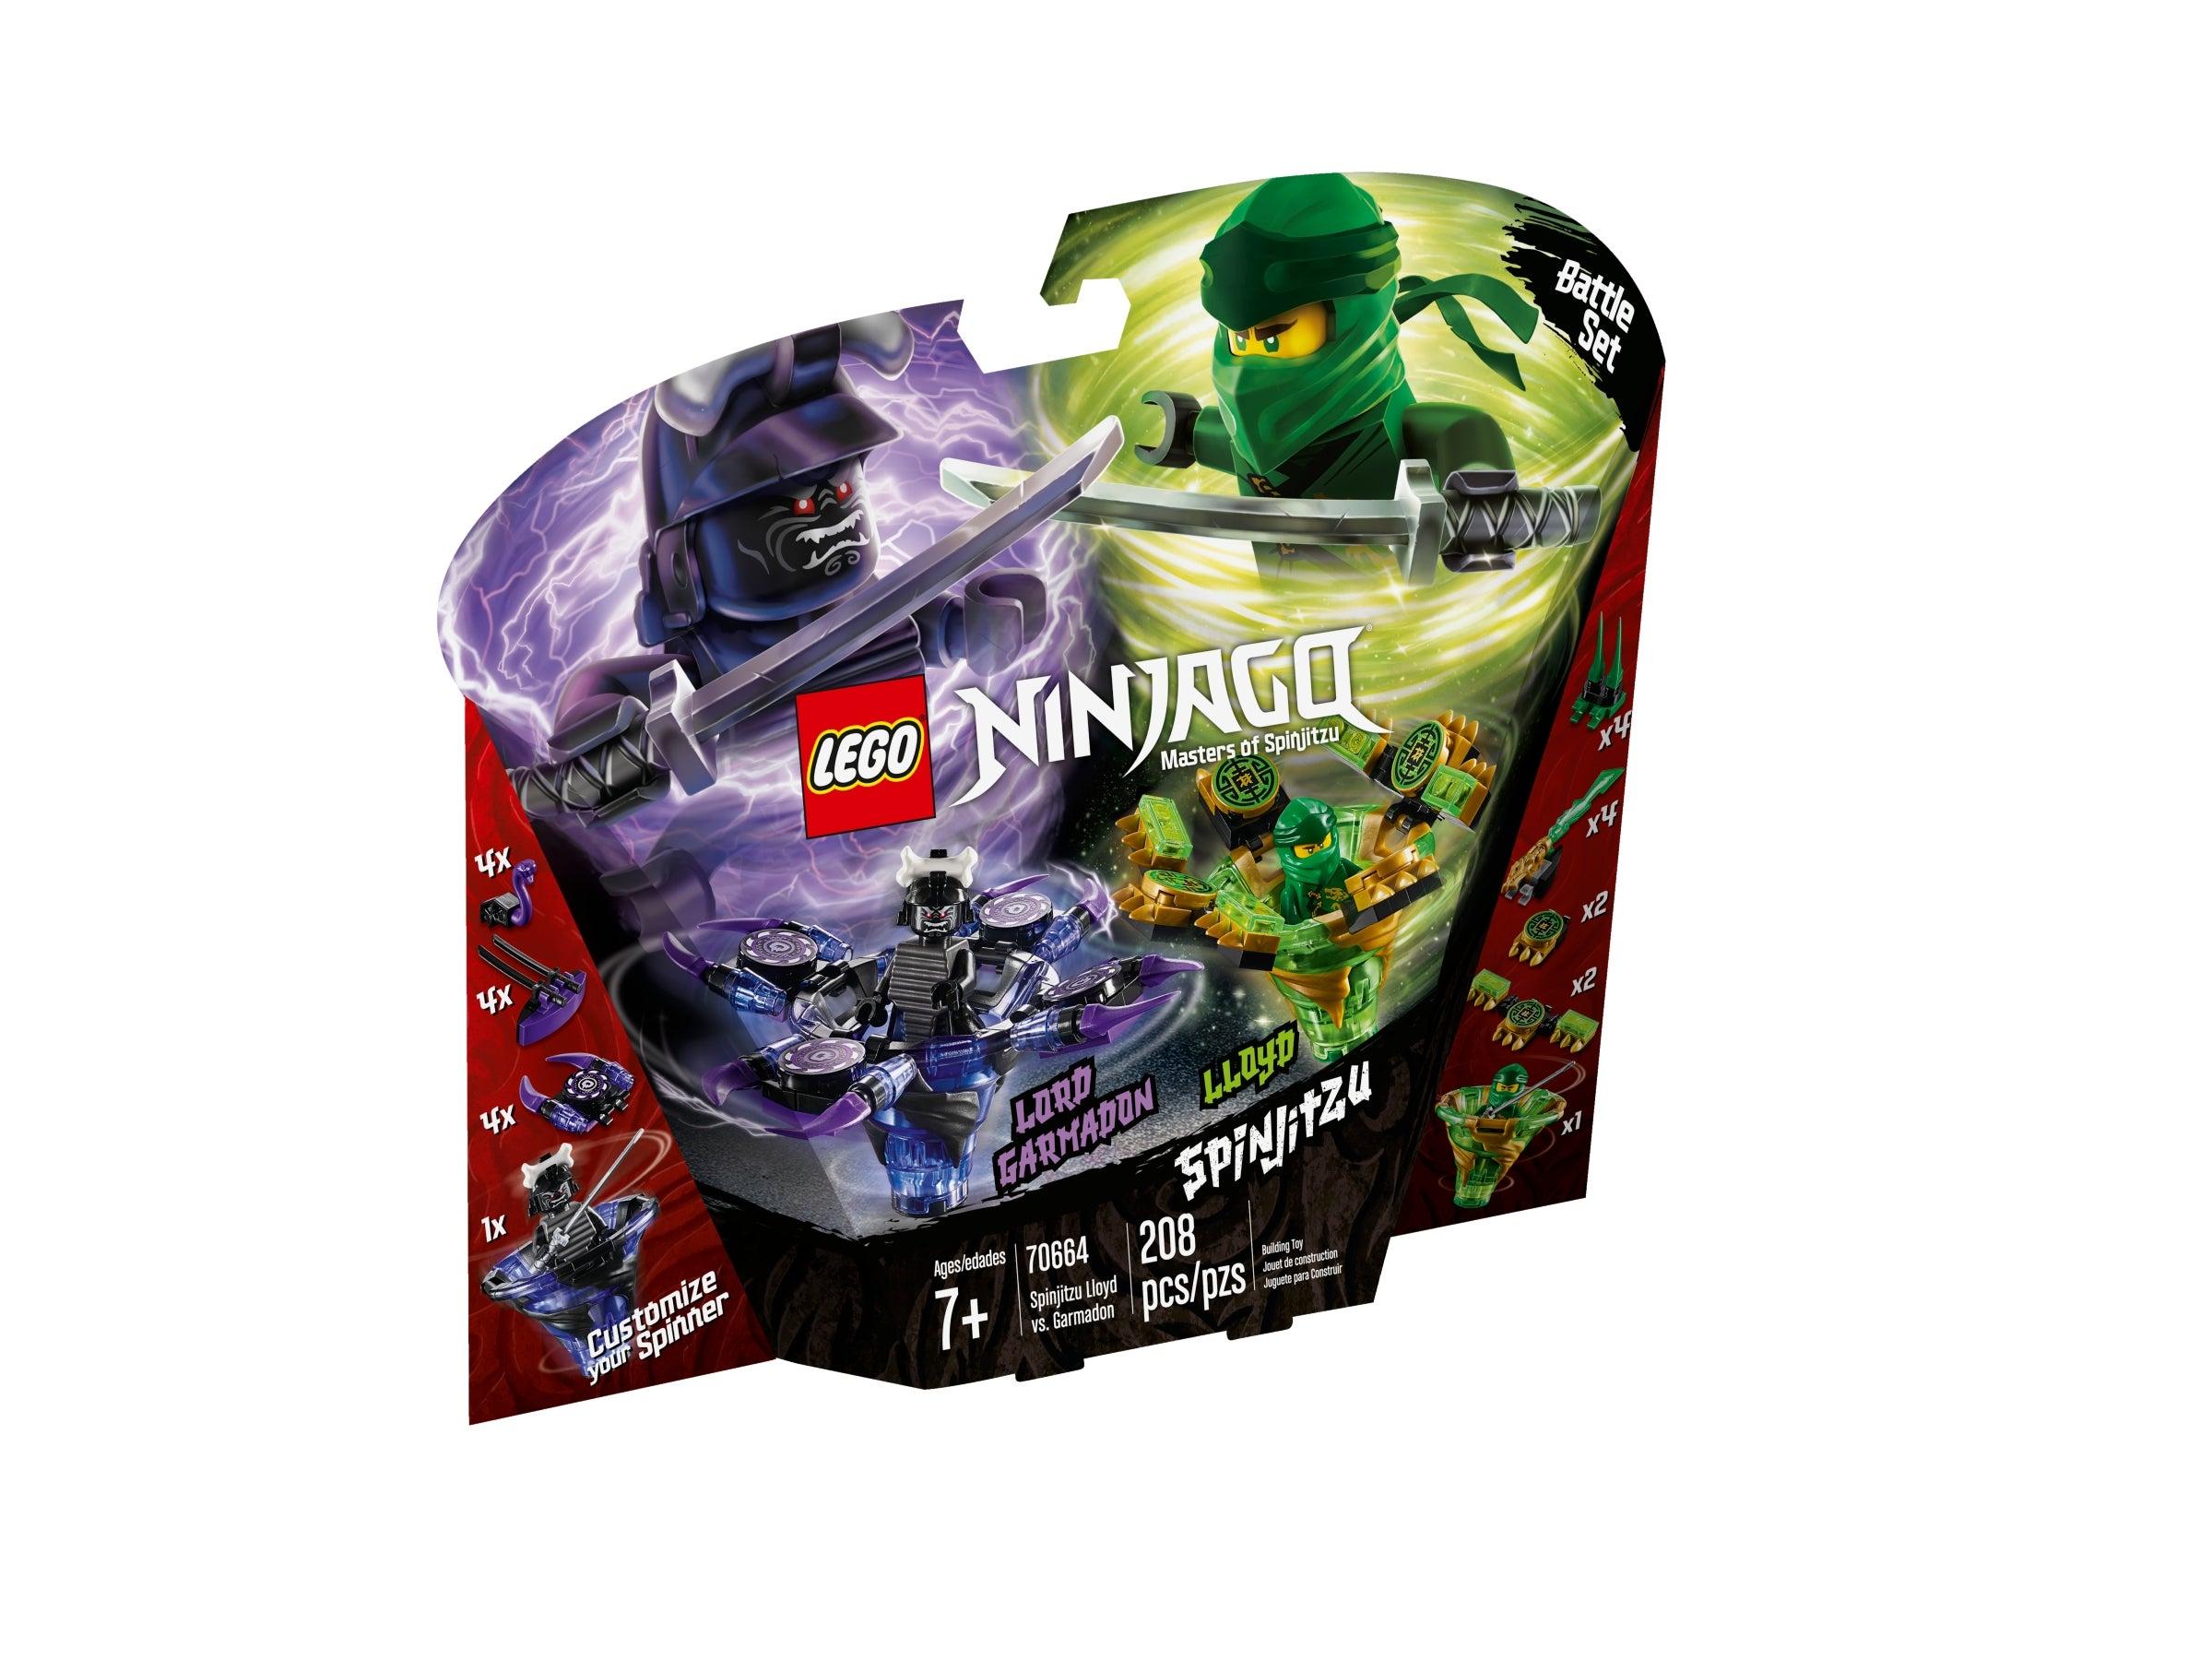 Garmadon et 70663 ña /& Wu n1//19 Lego Ninjago 70664 Spinjitzu Lloyd vs